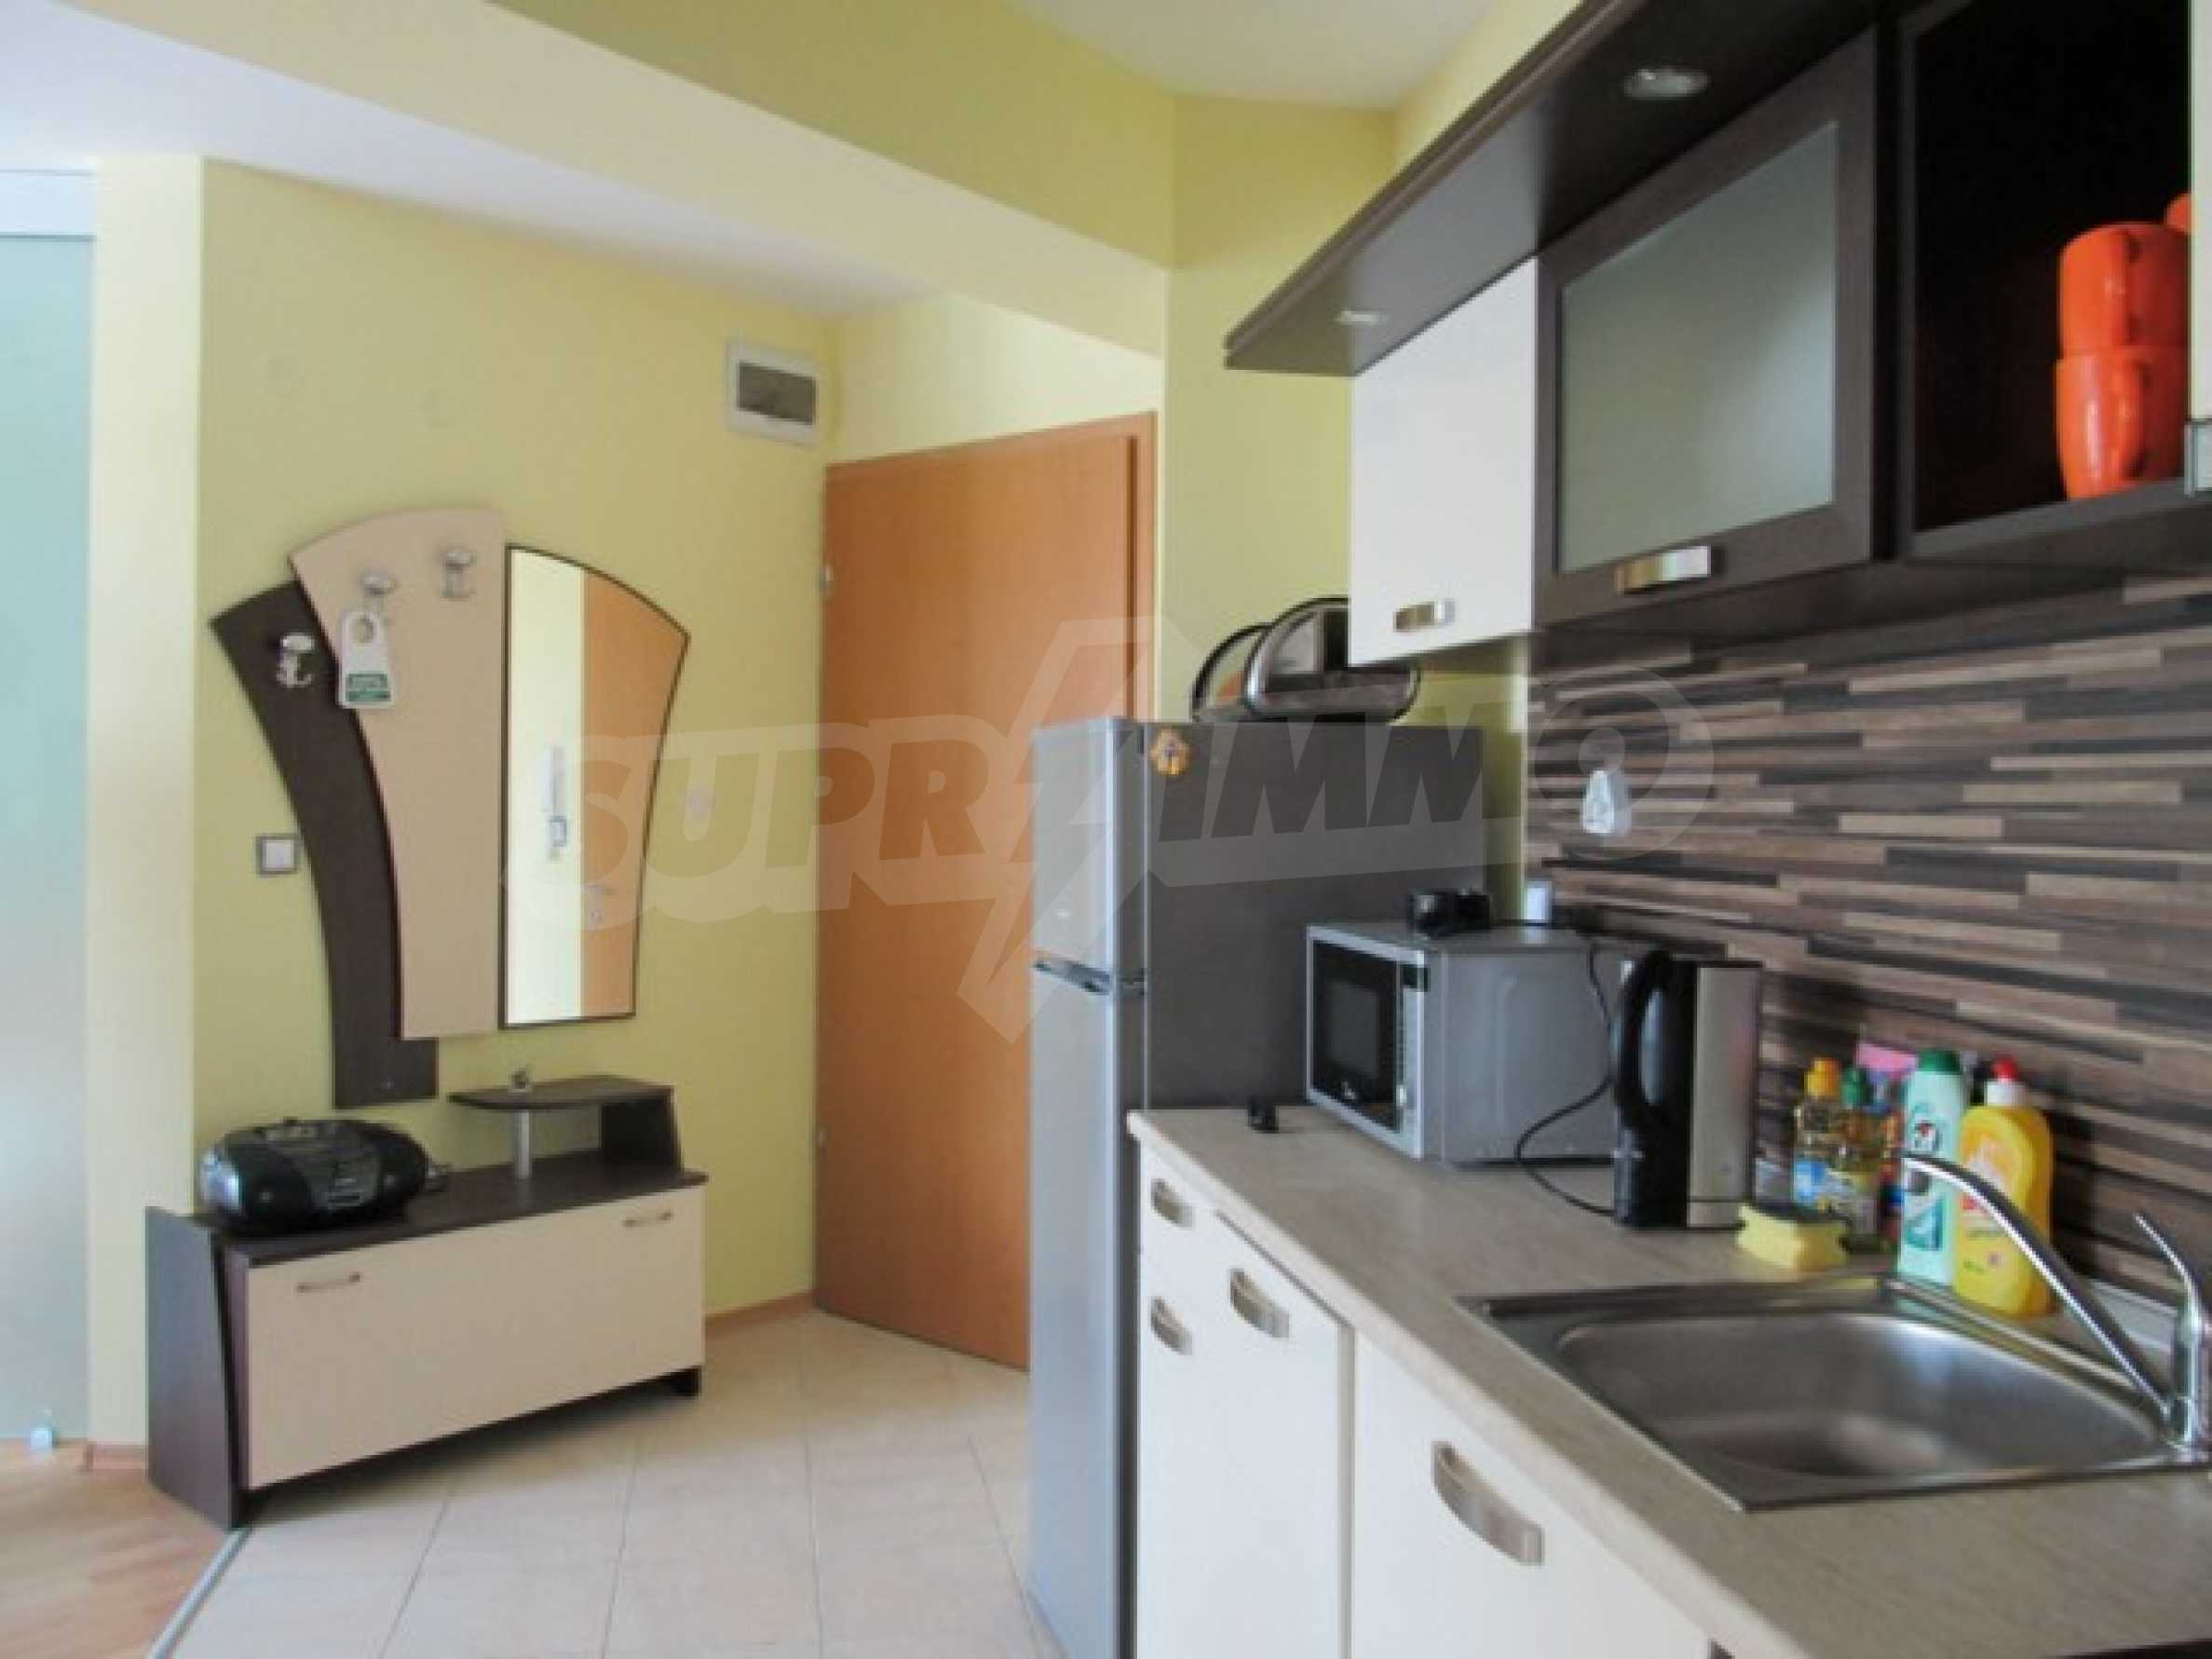 Тристаен апартамент за продажба в Поморие 9